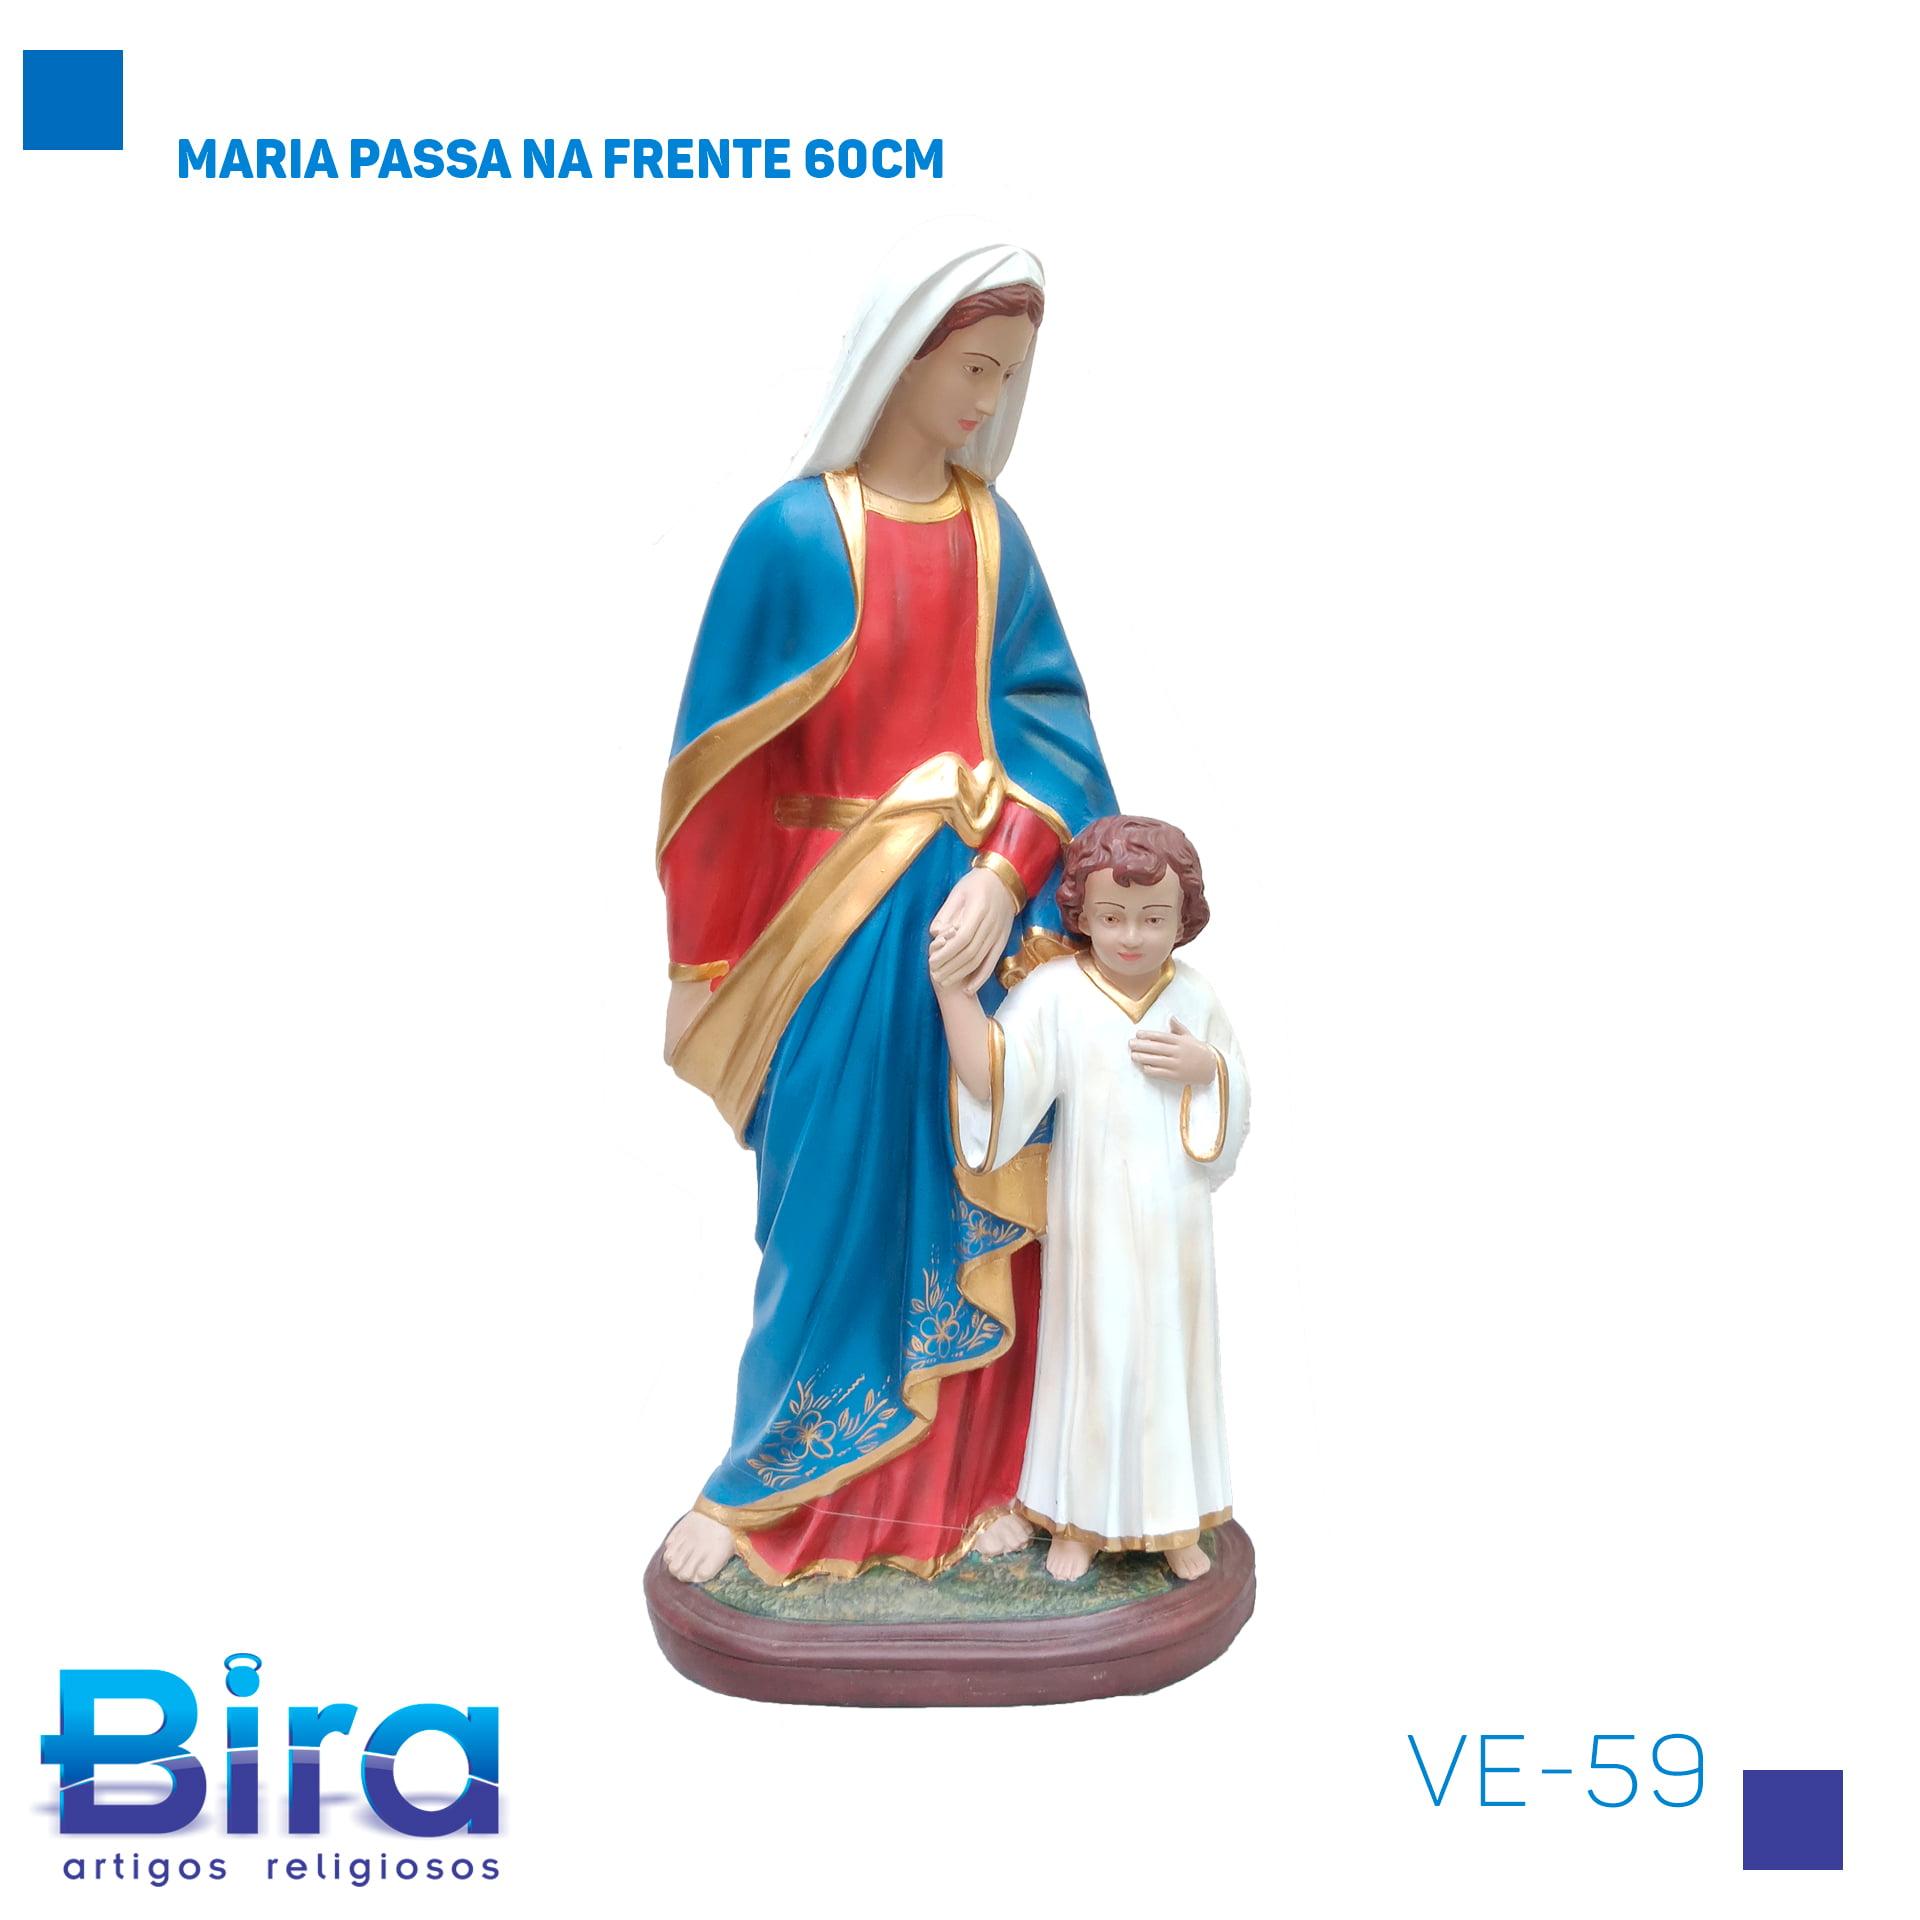 Bira Artigos Religiosos - MARIA PASSA NA FRENTE 60CM Cód. VE-59